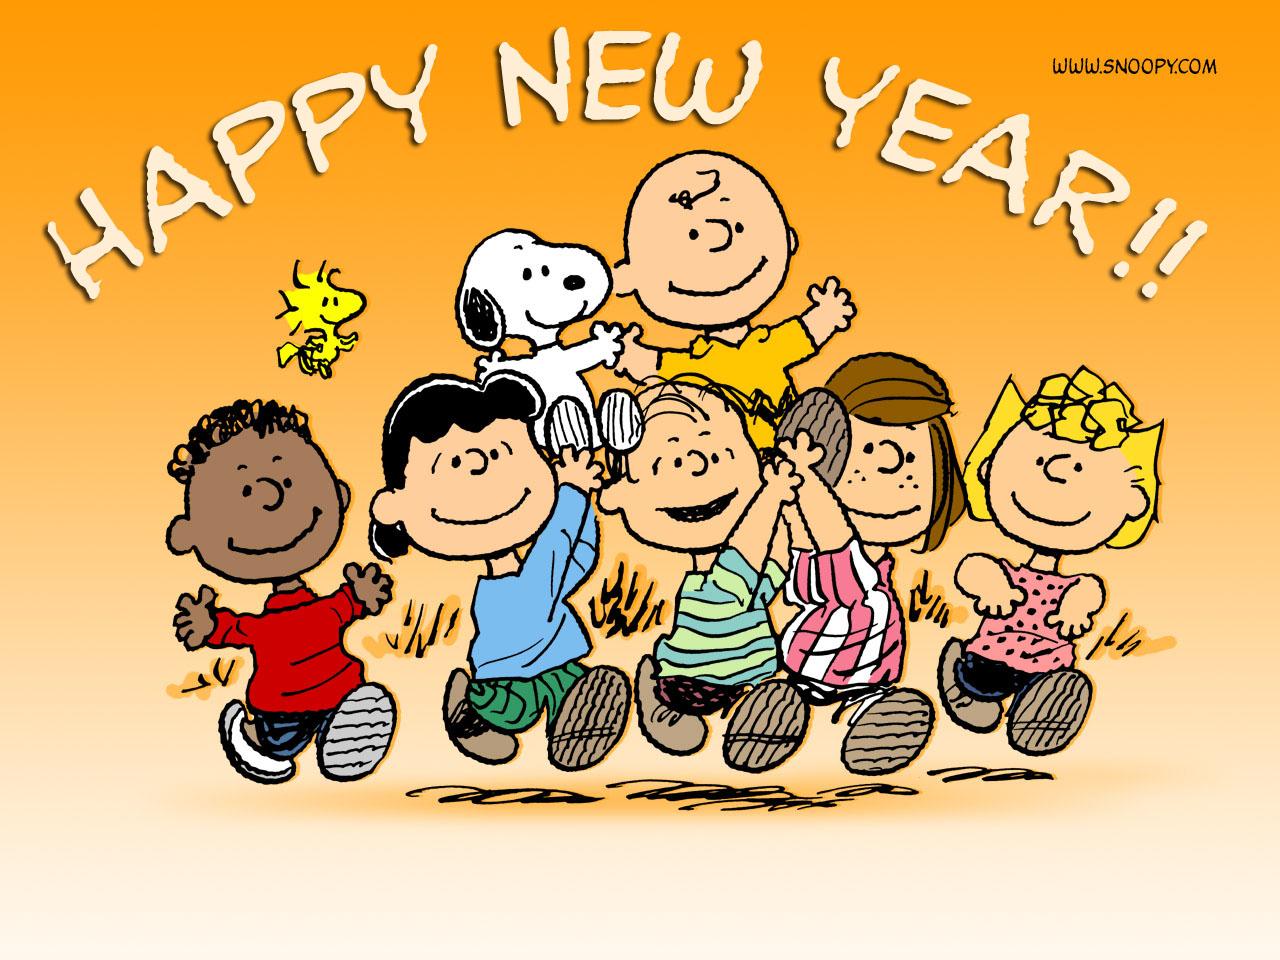 http://4.bp.blogspot.com/_eN9nCQOP-mE/TRmxwVW7BUI/AAAAAAAAAq4/iWHgXmWXAiE/s1600/happy_new_year_charlie_brown.jpg